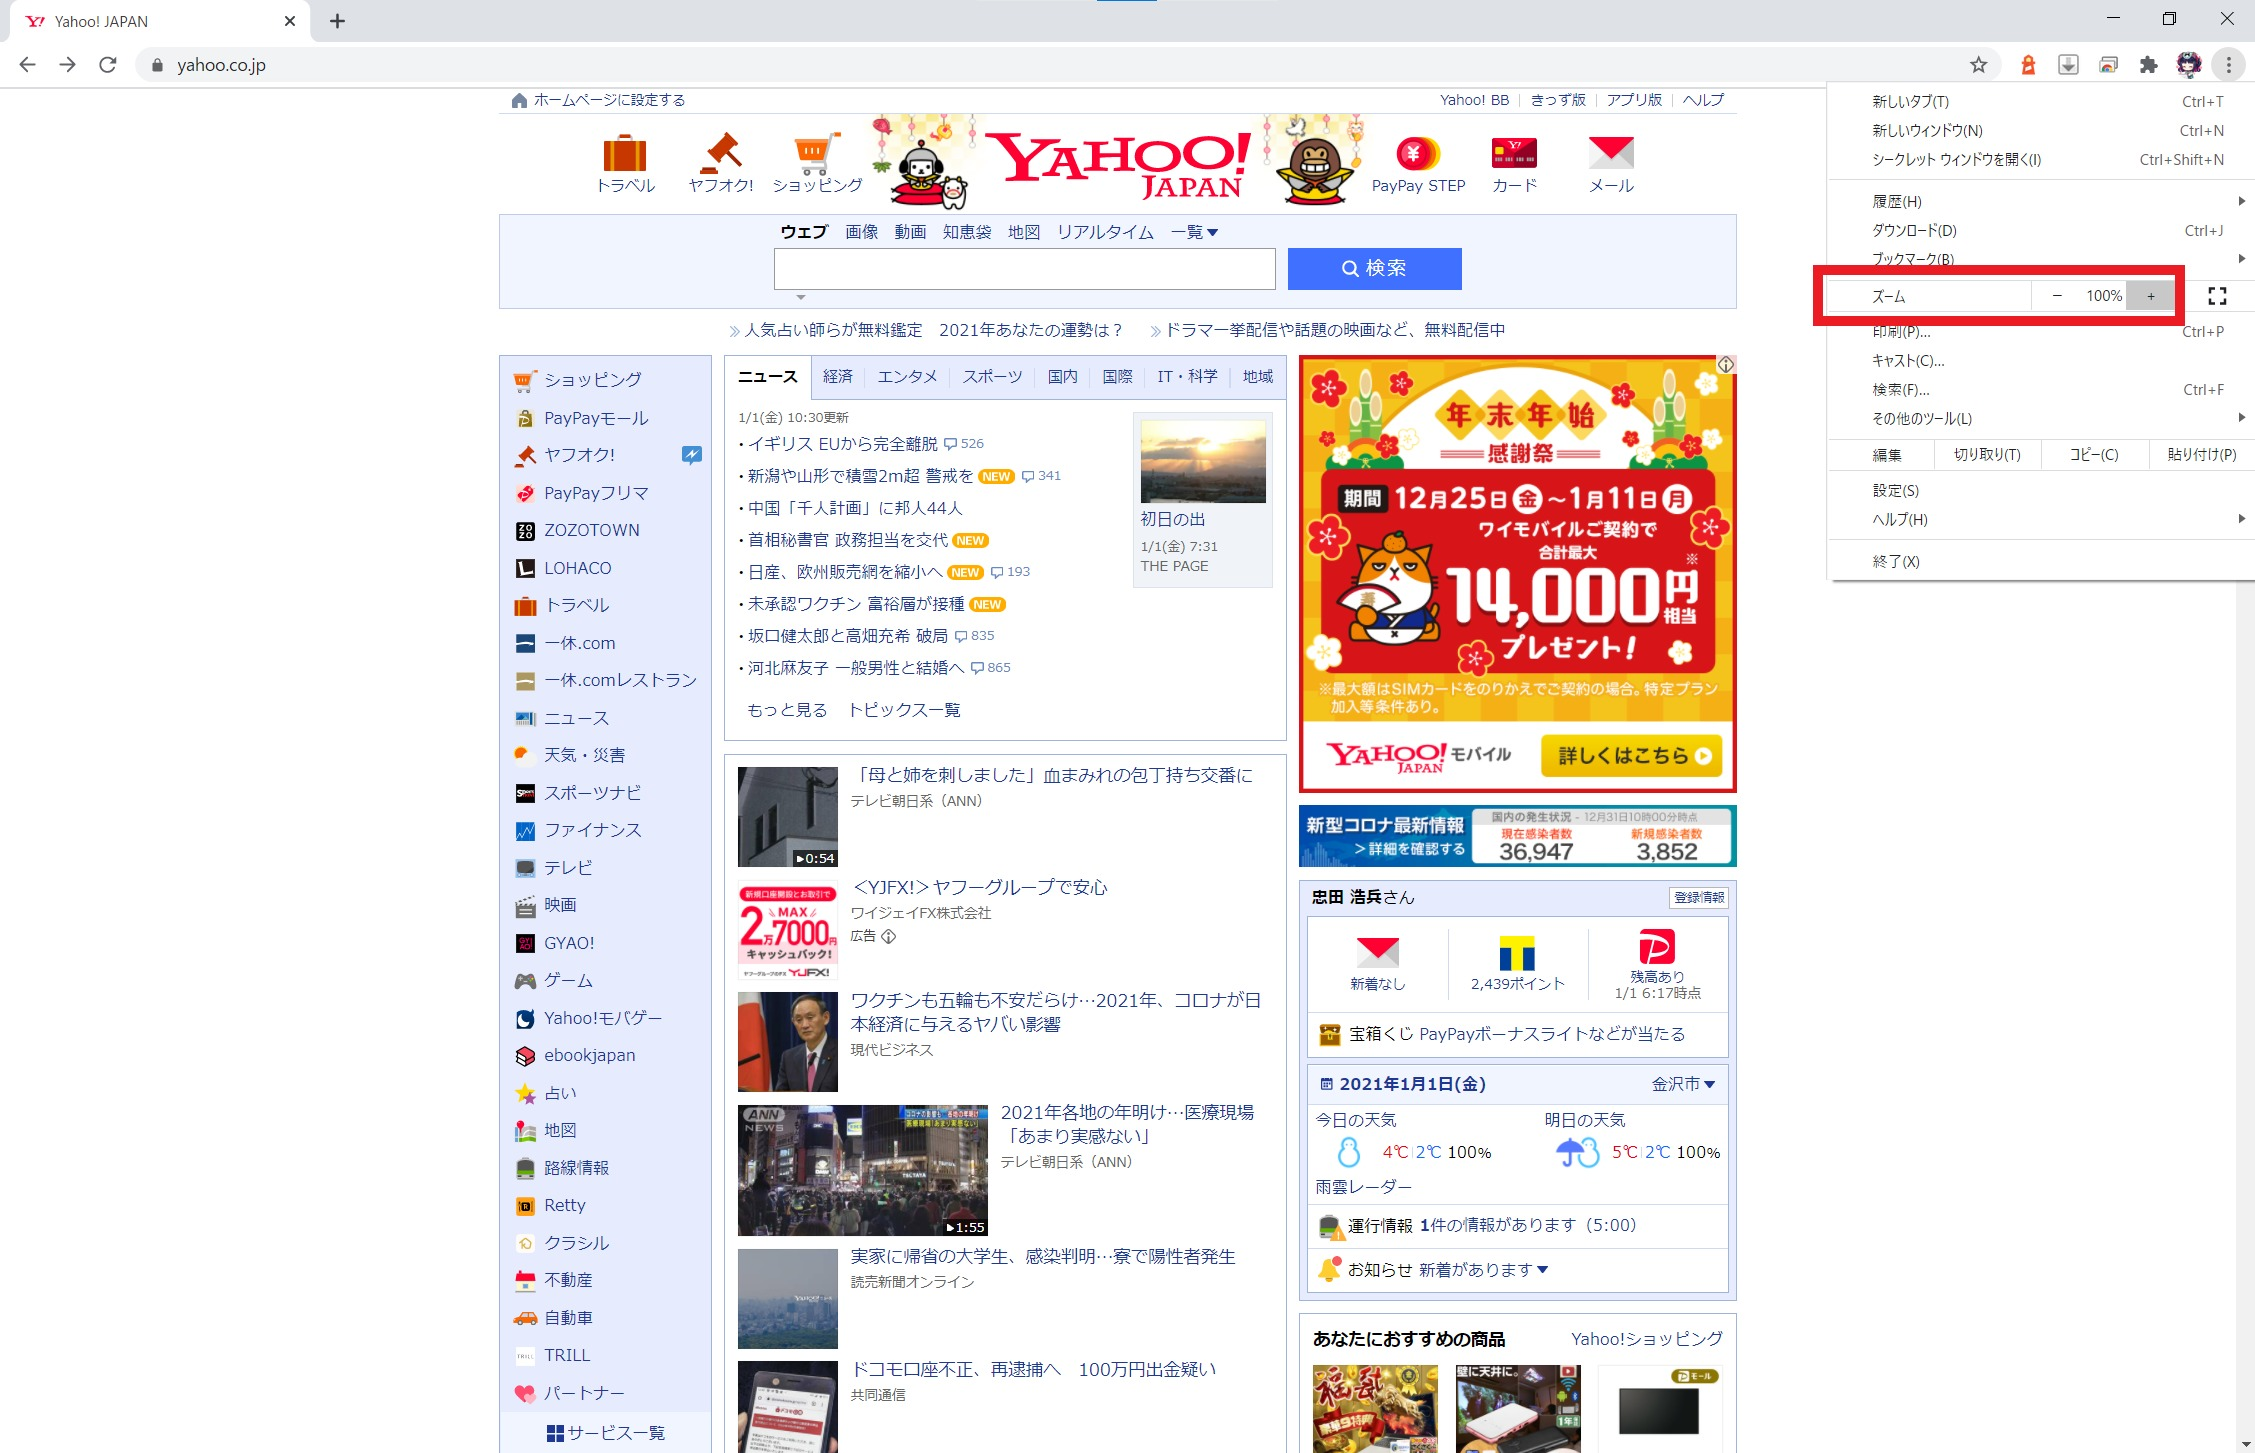 Google Chromeで画面サイズを変更する方法【Windows10】